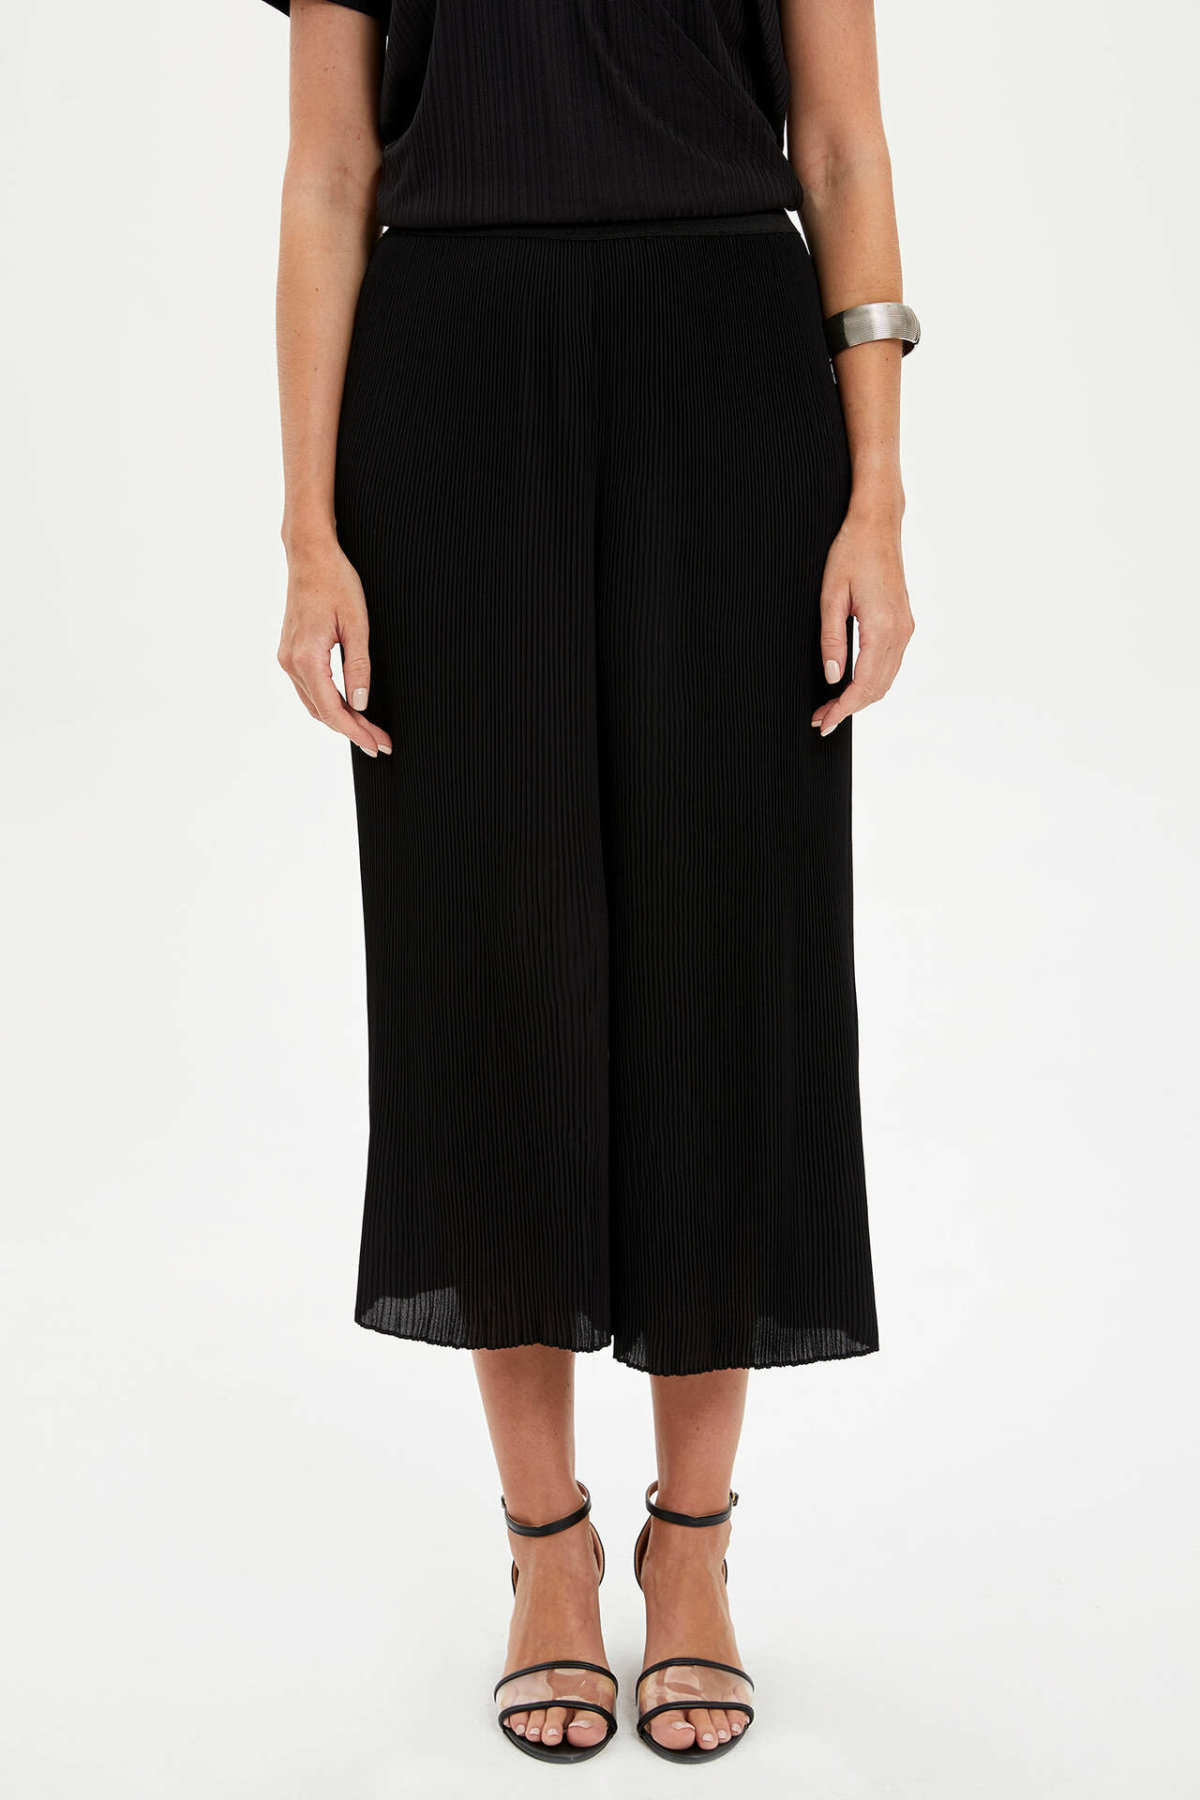 DeFacto Woman Summer Black Chiffon Long Pants Women Casual Elastic Bottoms Female Wide-leg Loose Capri-L7179AZ19SM